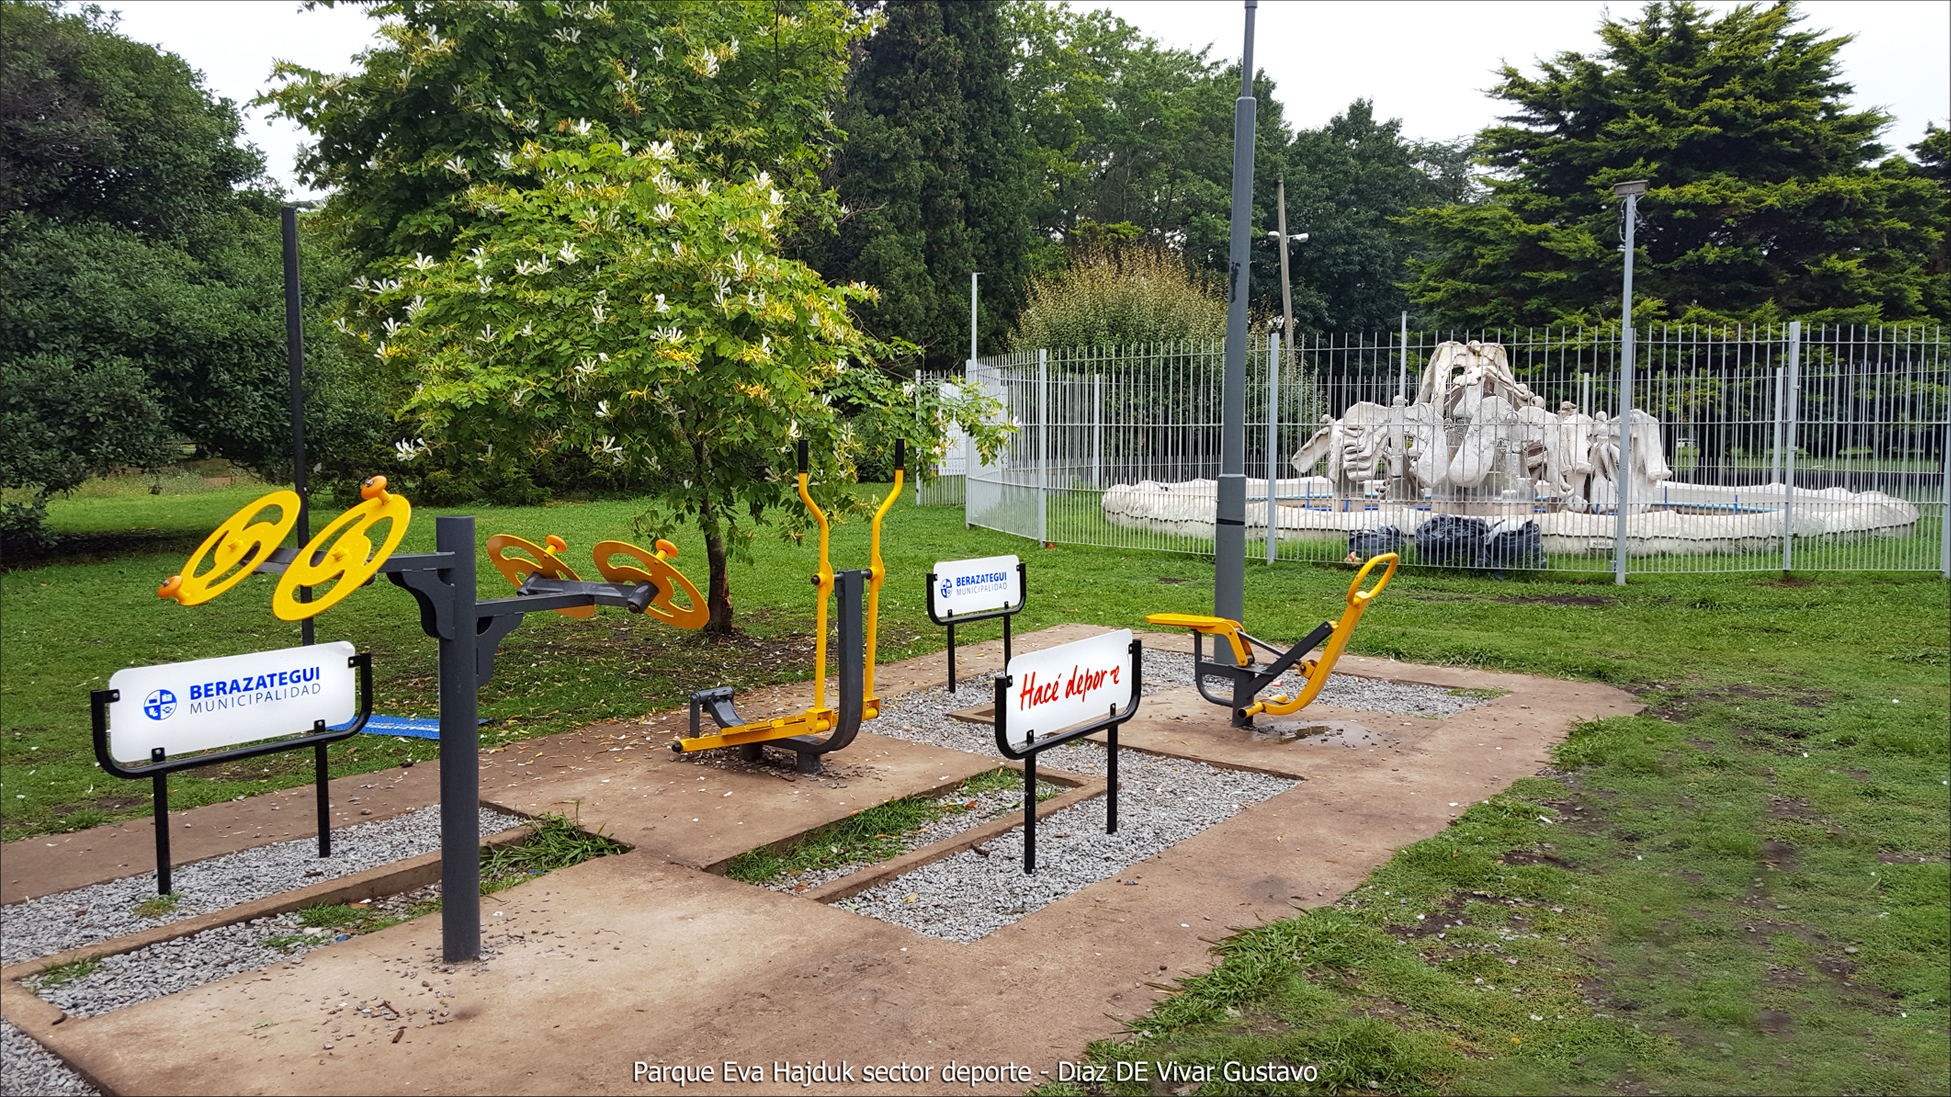 Parque Eva Hajduk sector deporte - Diaz De Vivar Gustavo